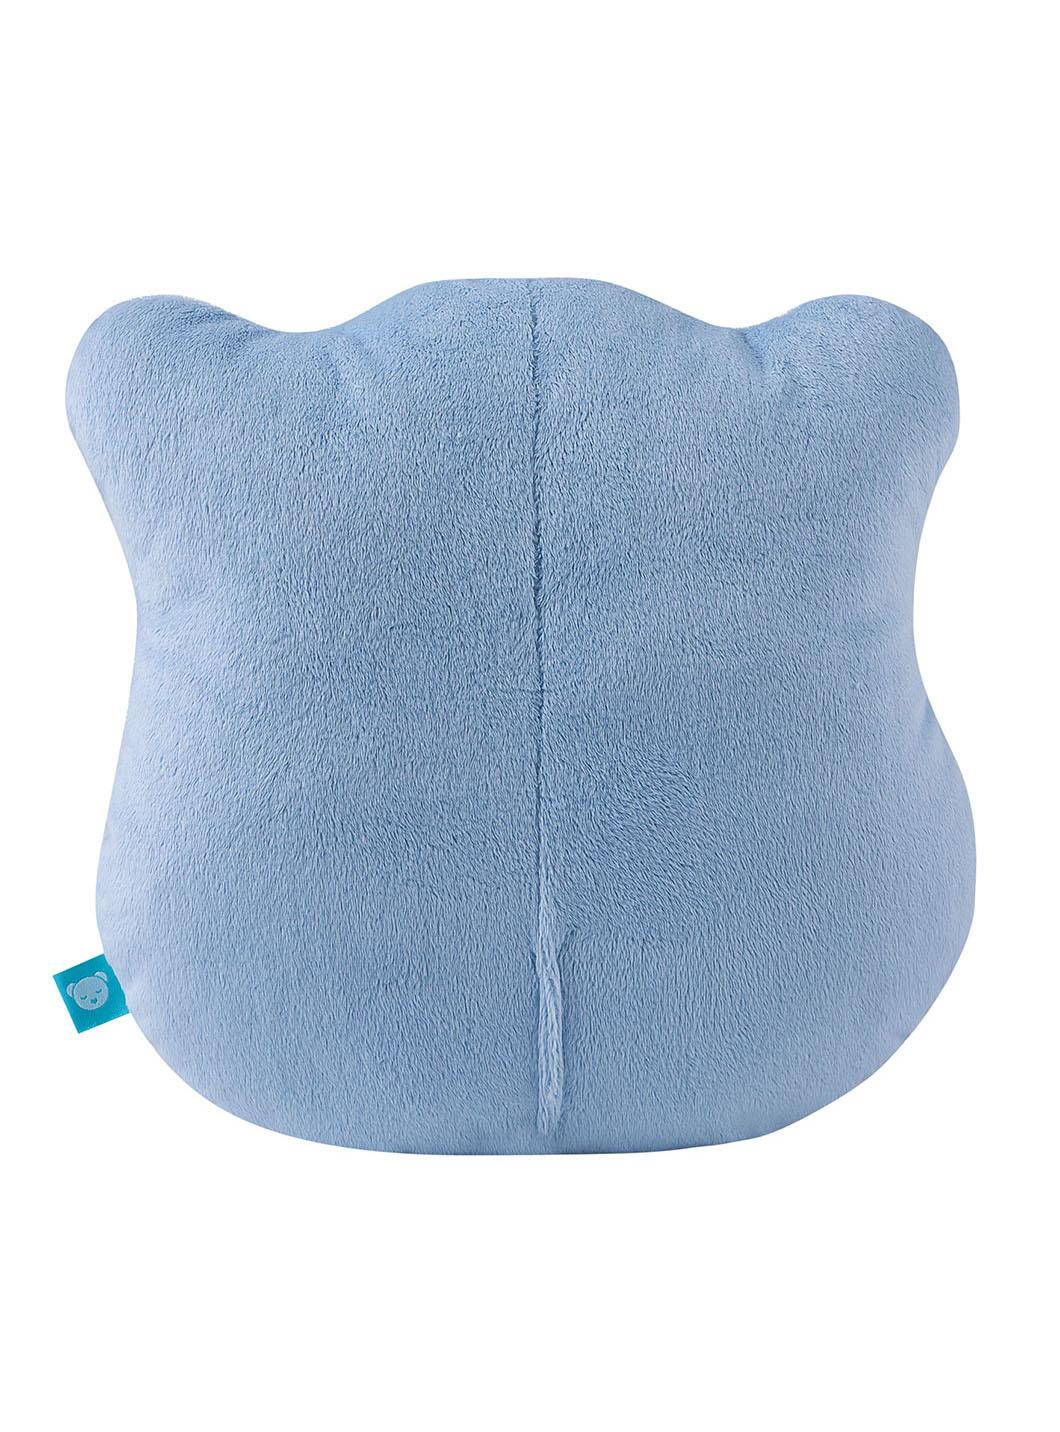 myHummy Cuscino - azzurro